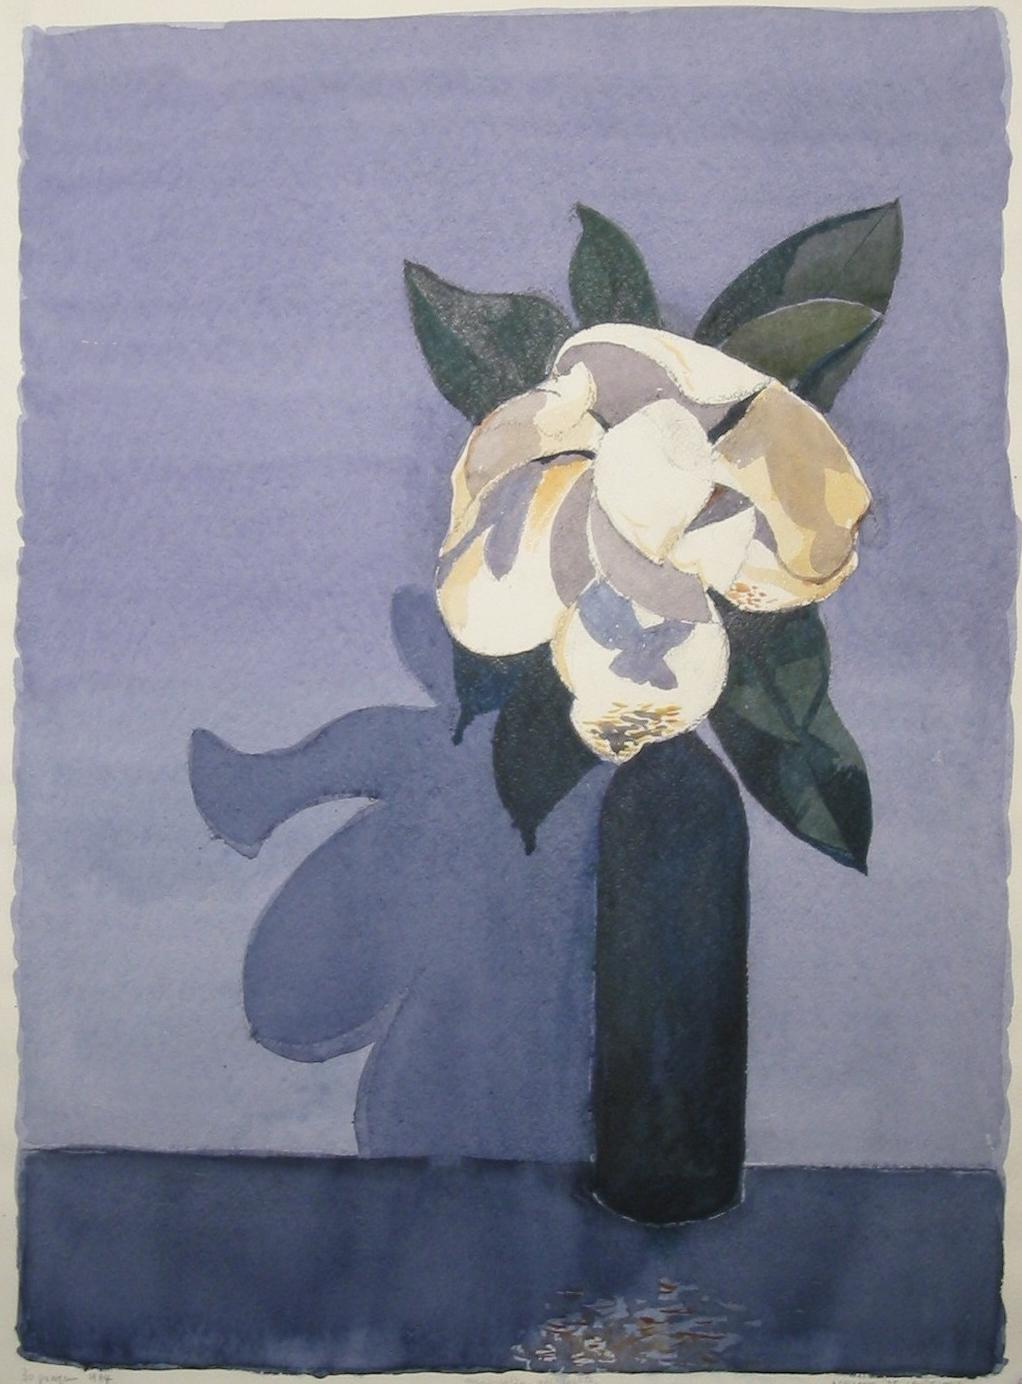 Magnolia Appassita - 1994 - Acquerello su Cartoncino - 75,5x56